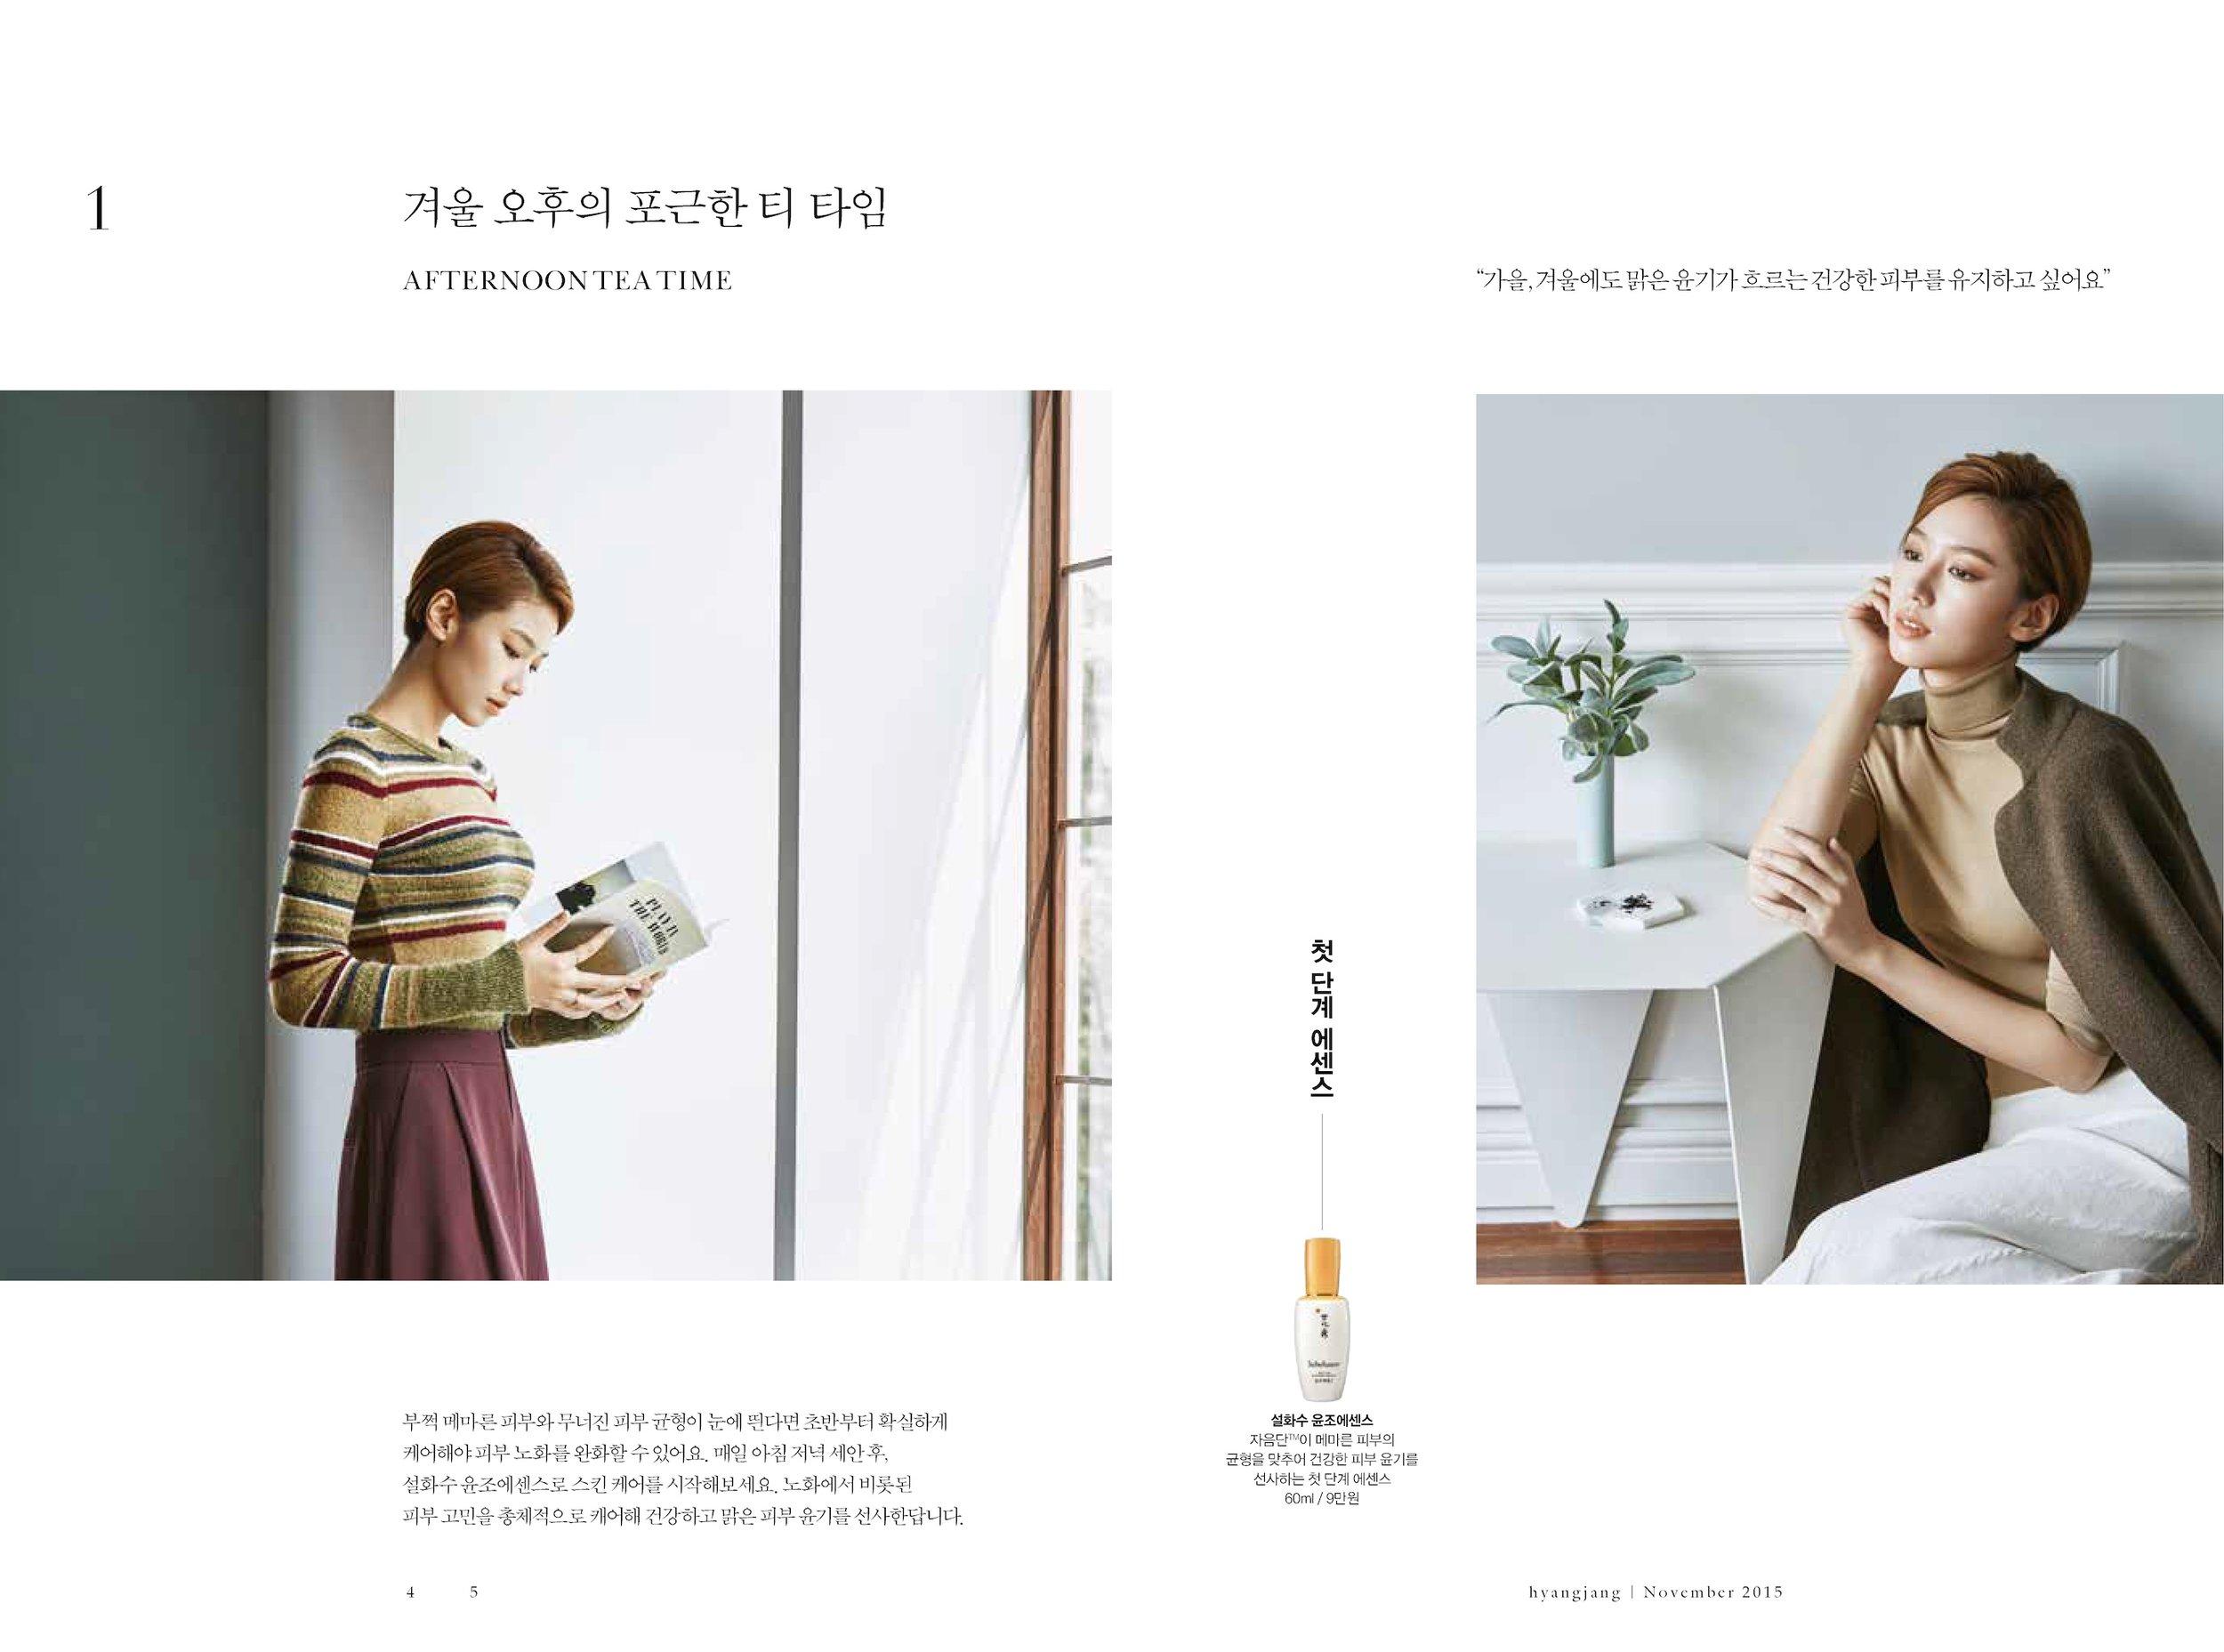 hyangjang-201511_페이지_02.jpeg